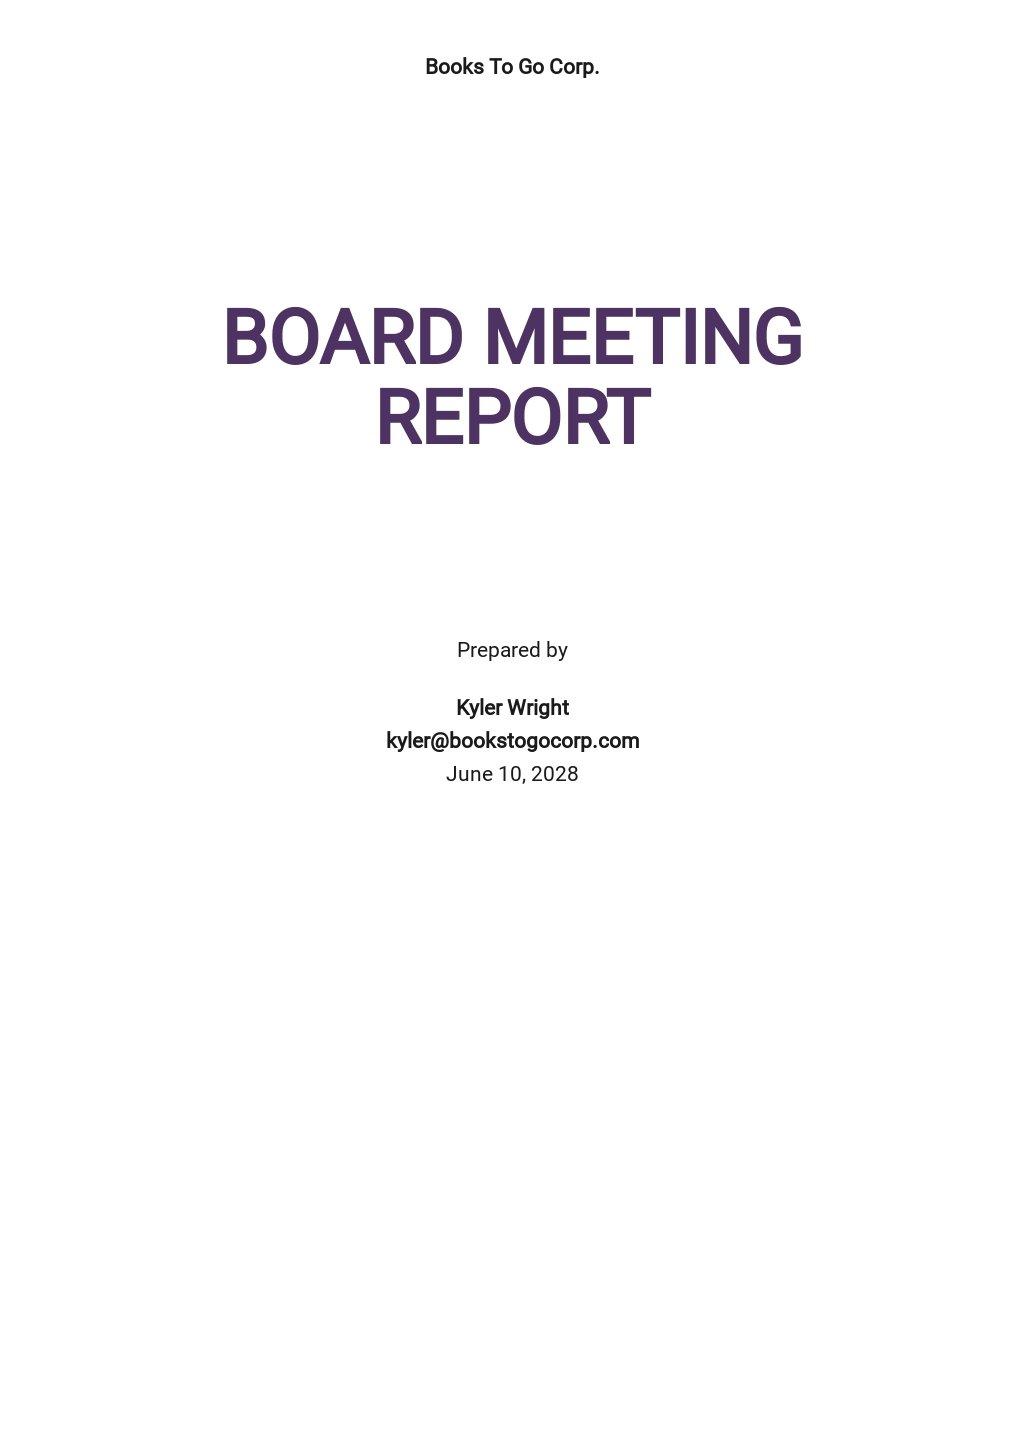 Board Meeting Report Template